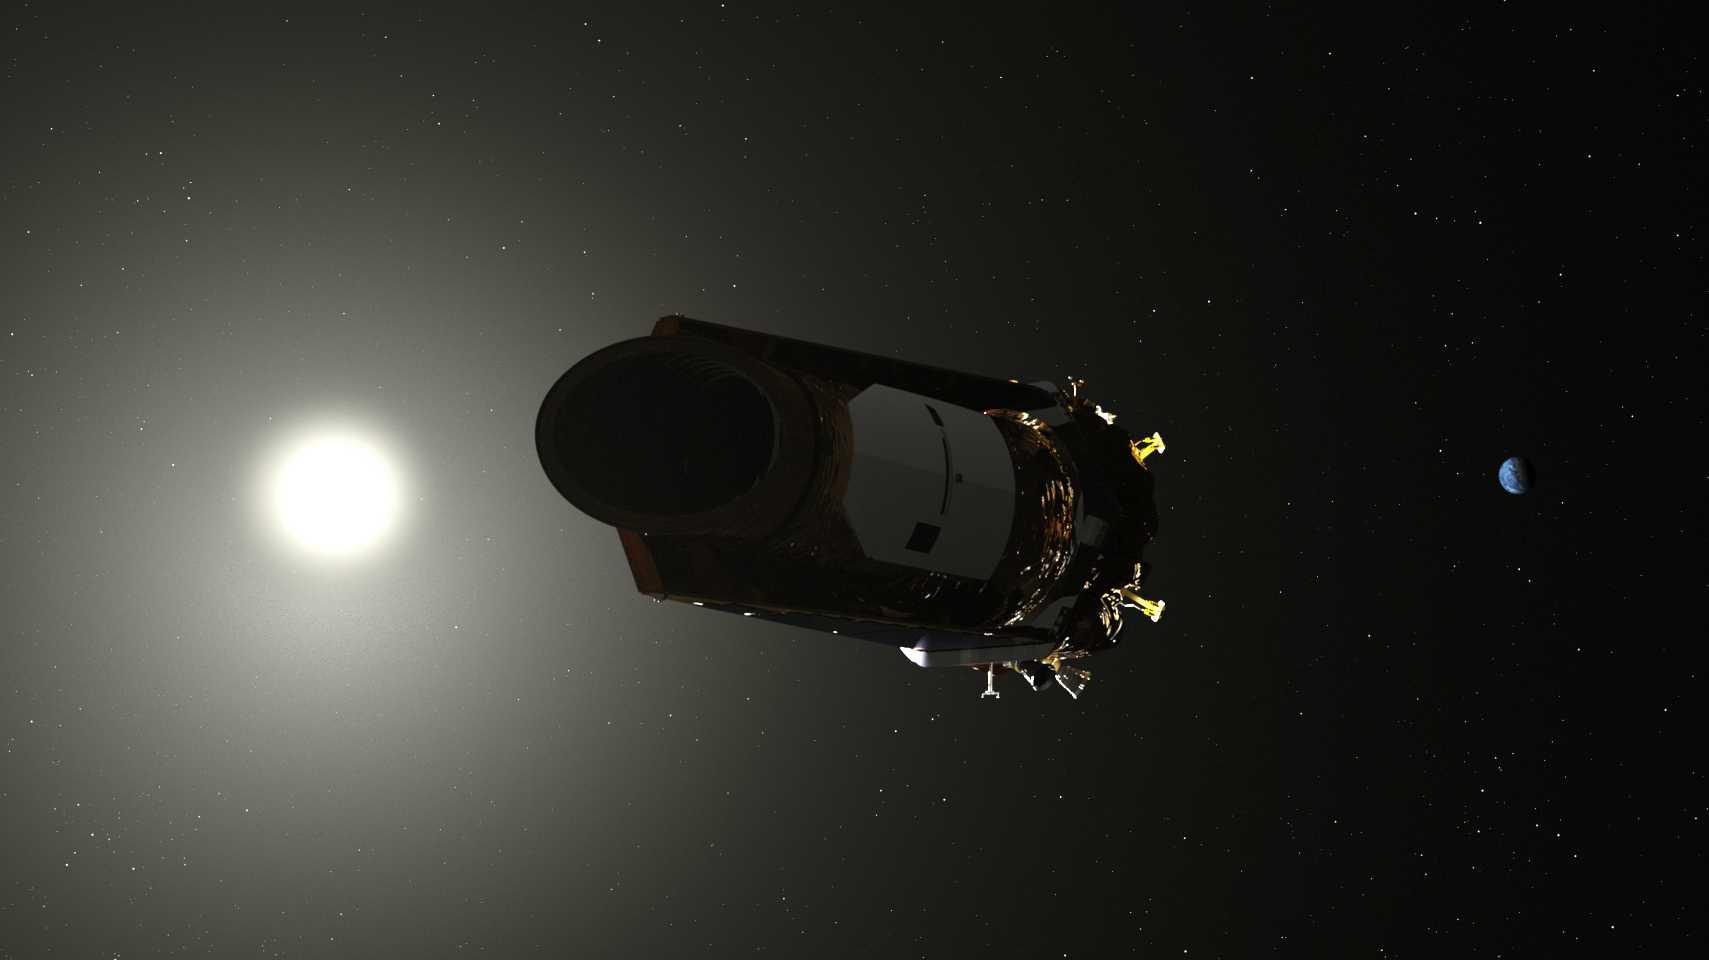 Das Ende naht: Weltraumteleskop Kepler erst einmal stillgelegt